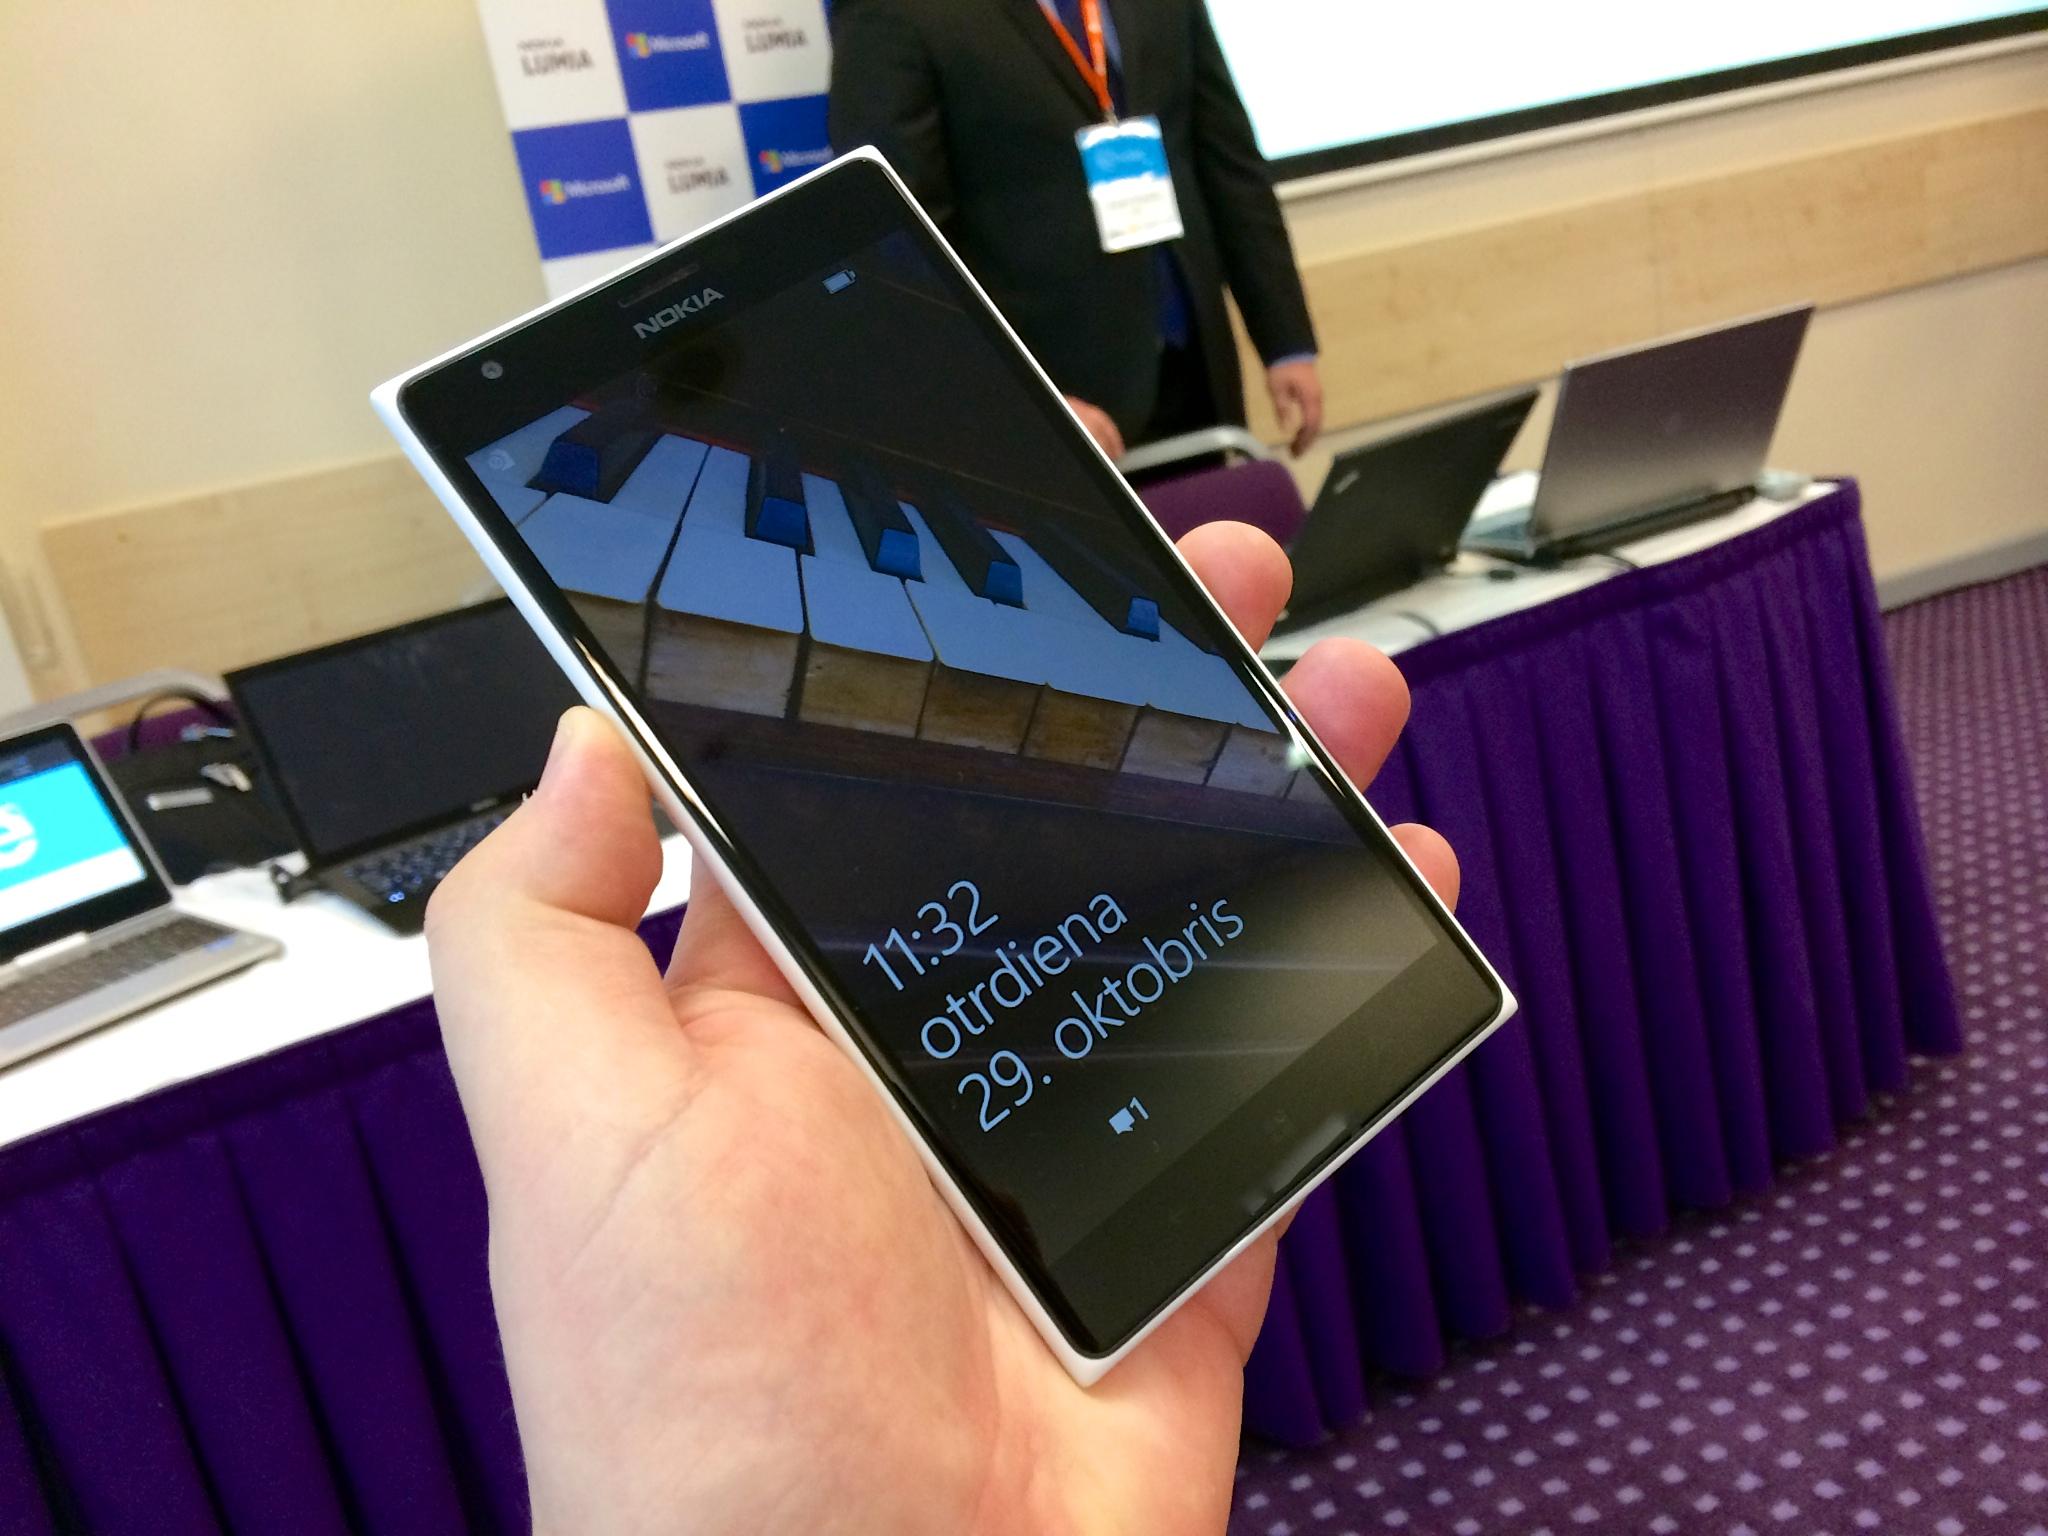 File:Nokia Lumia 1520.jpg